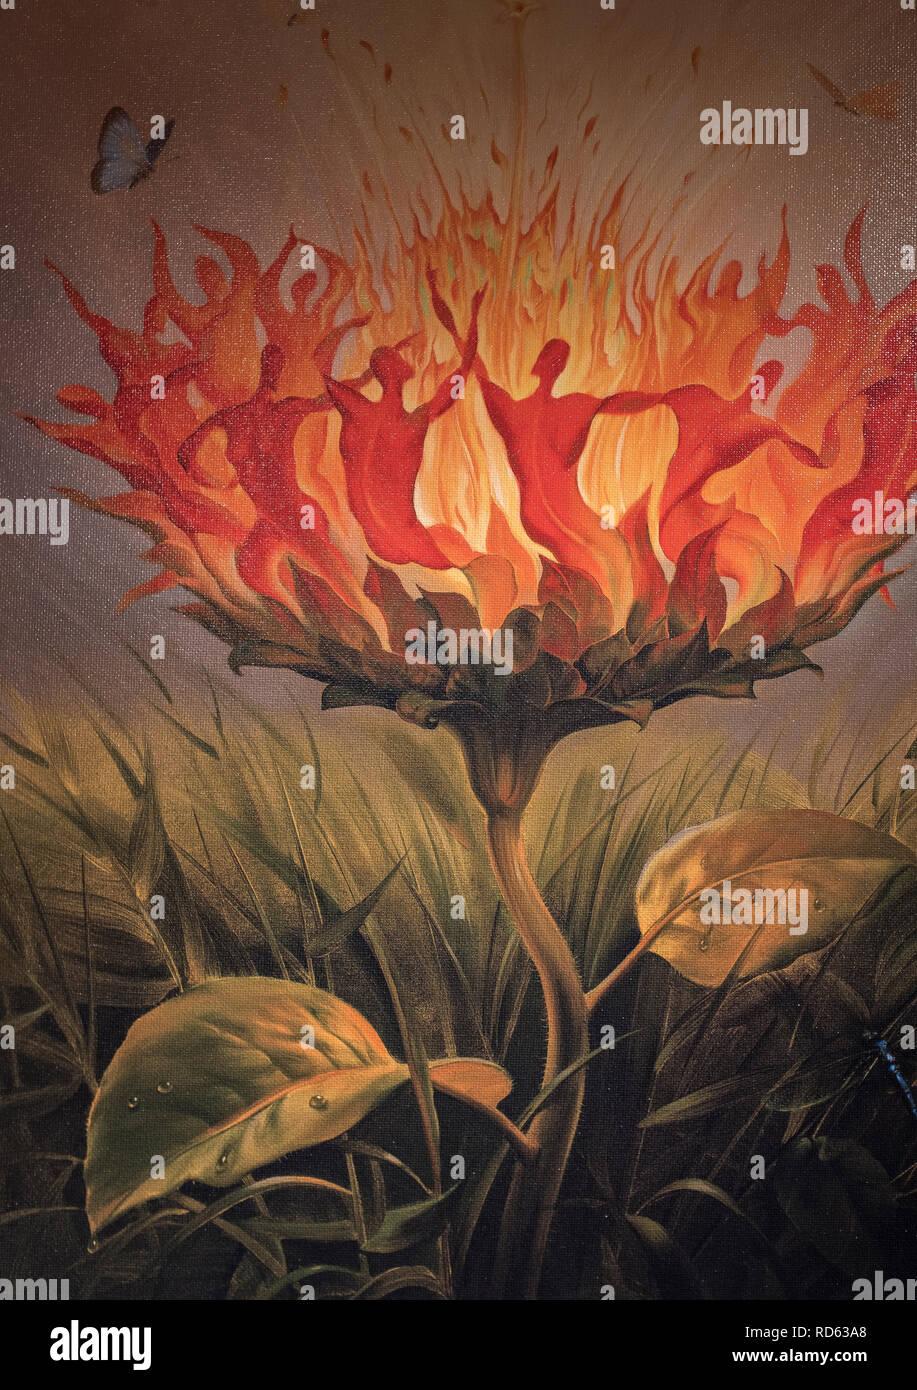 Russian born surrealist painter Vladimir Kush: (detail) 'Fiery Dance' hand signed limited edition - Stock Image